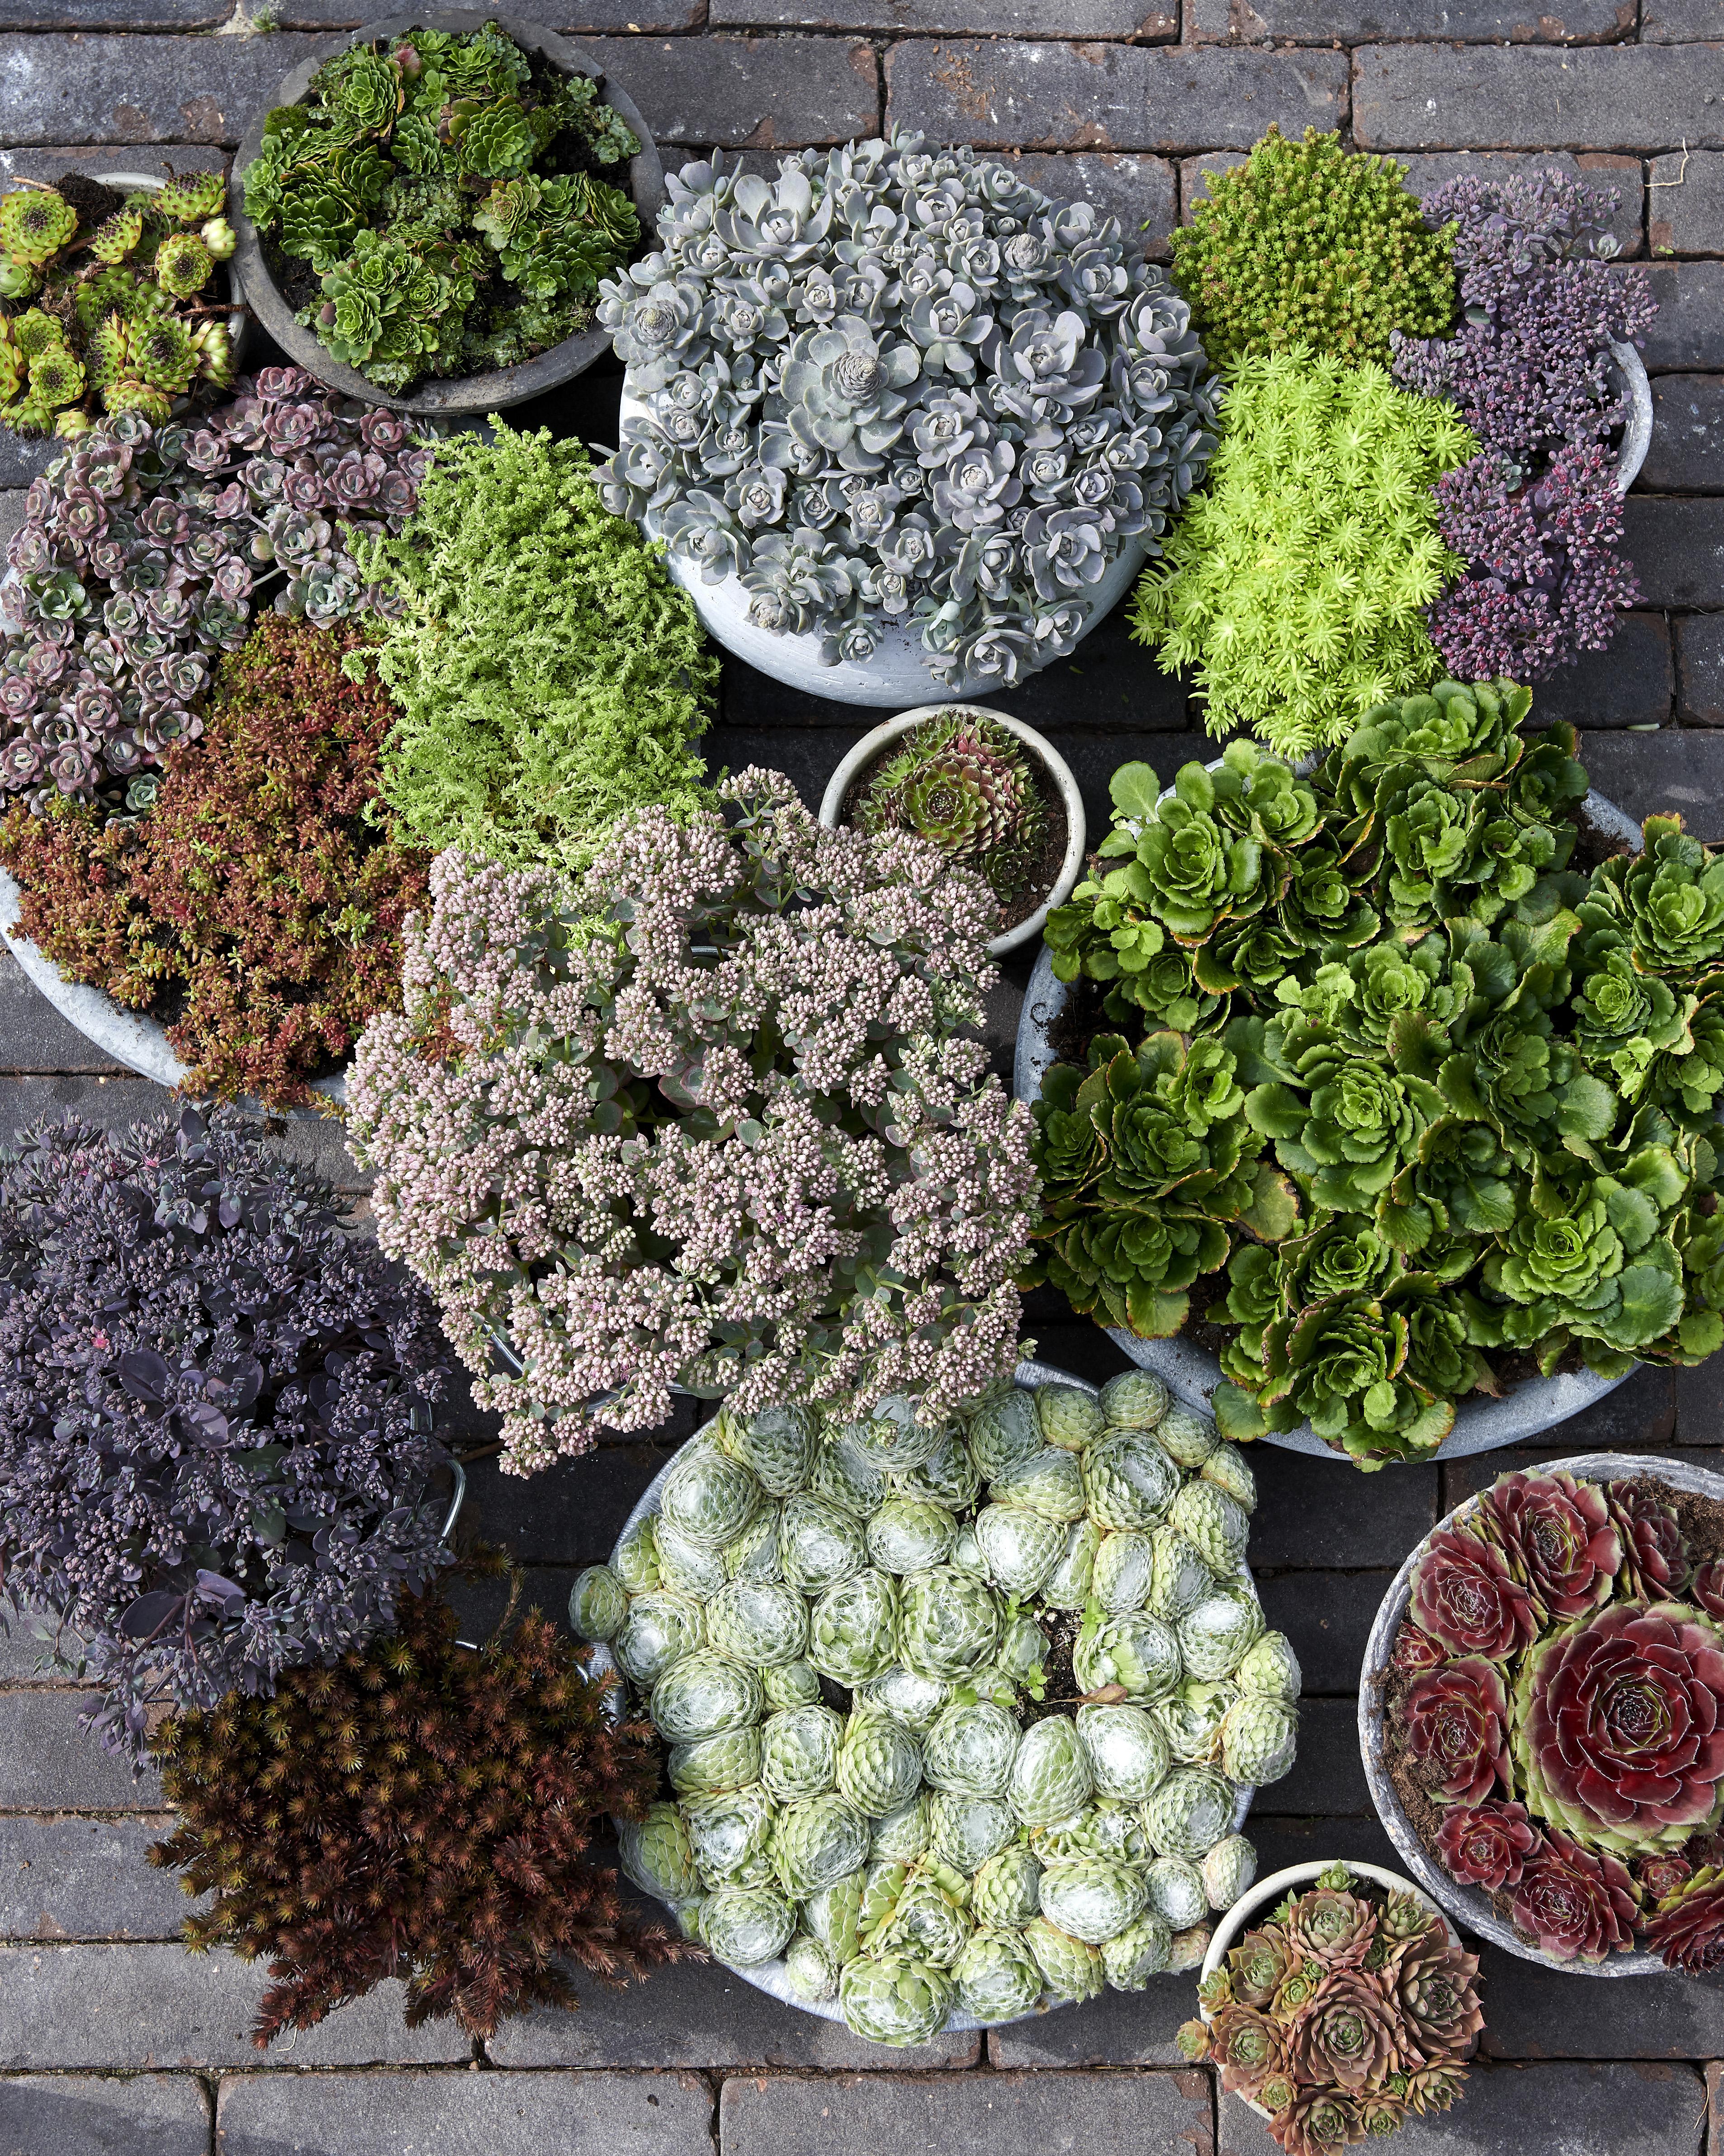 Groene Dakbedekkers, Tuinplant van de maand oktober 2019